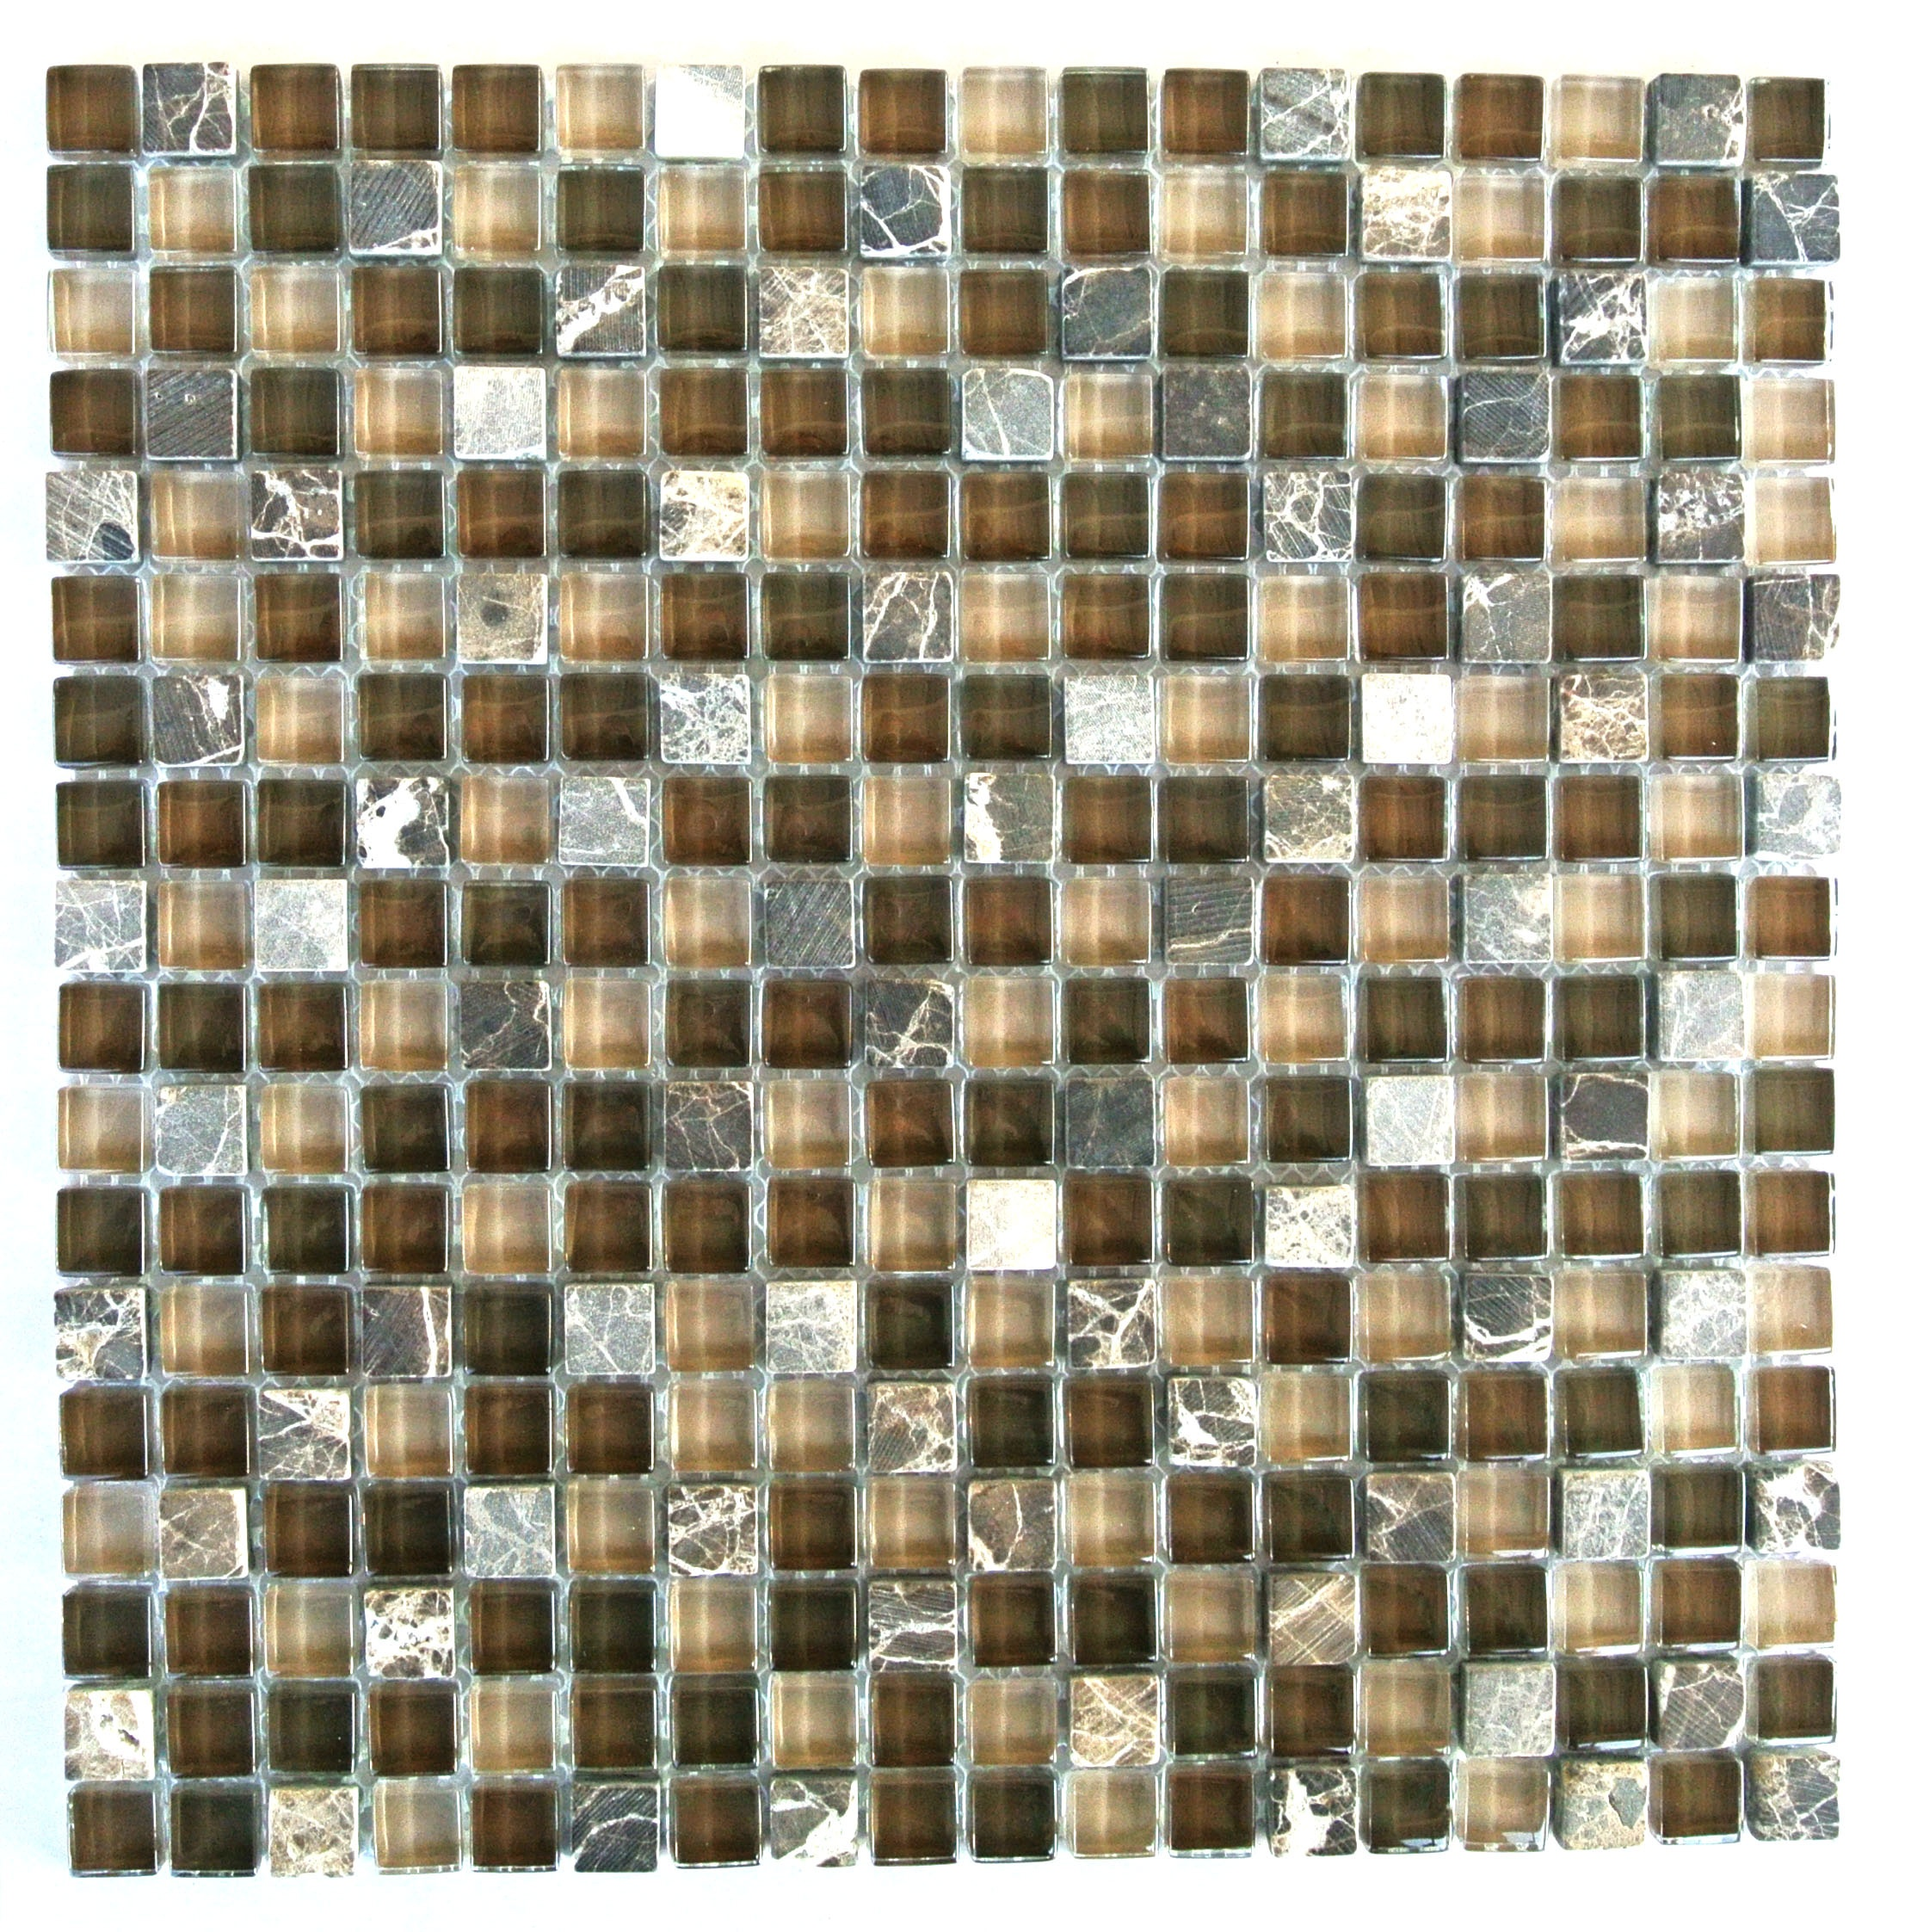 "Quartz 0.625"" x 0.625"" Multi Finish Brown Glass and Stone Square Backsplash Mosaic Wall & Floor Tile"